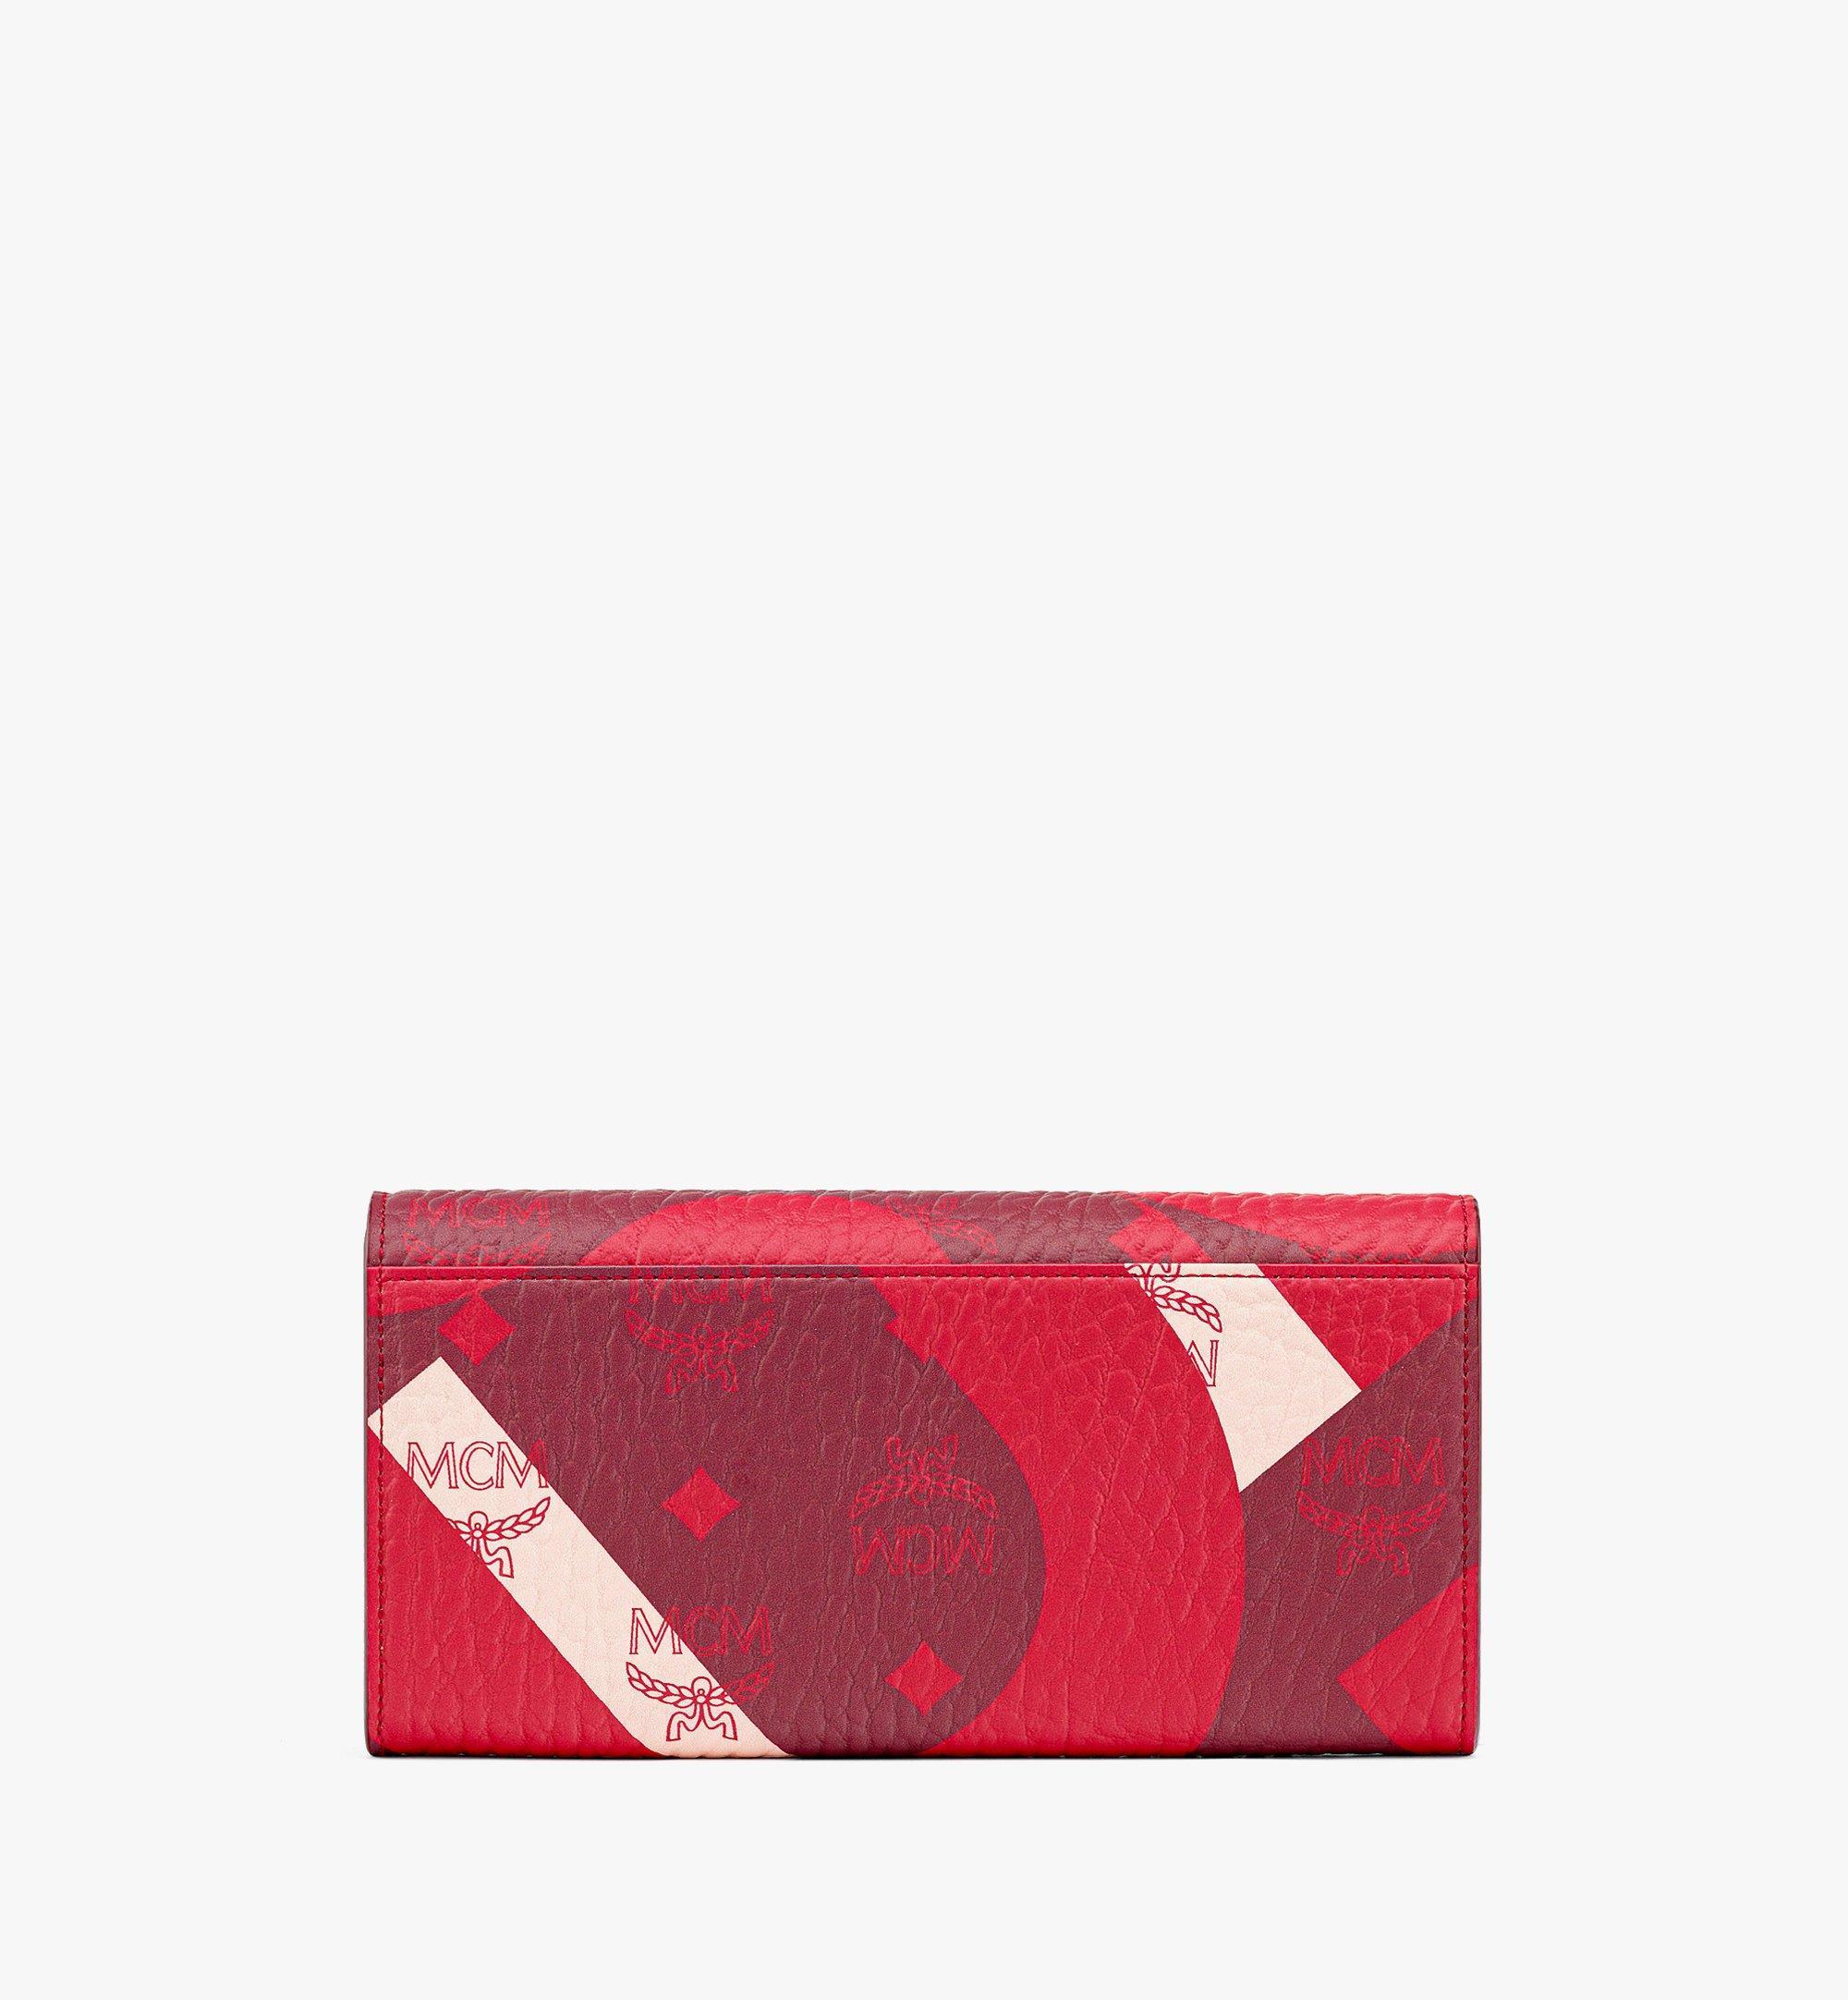 MCM Patricia Crossbody Wallet in Wave Visetos Red MYLBASX02R0001 Alternate View 2